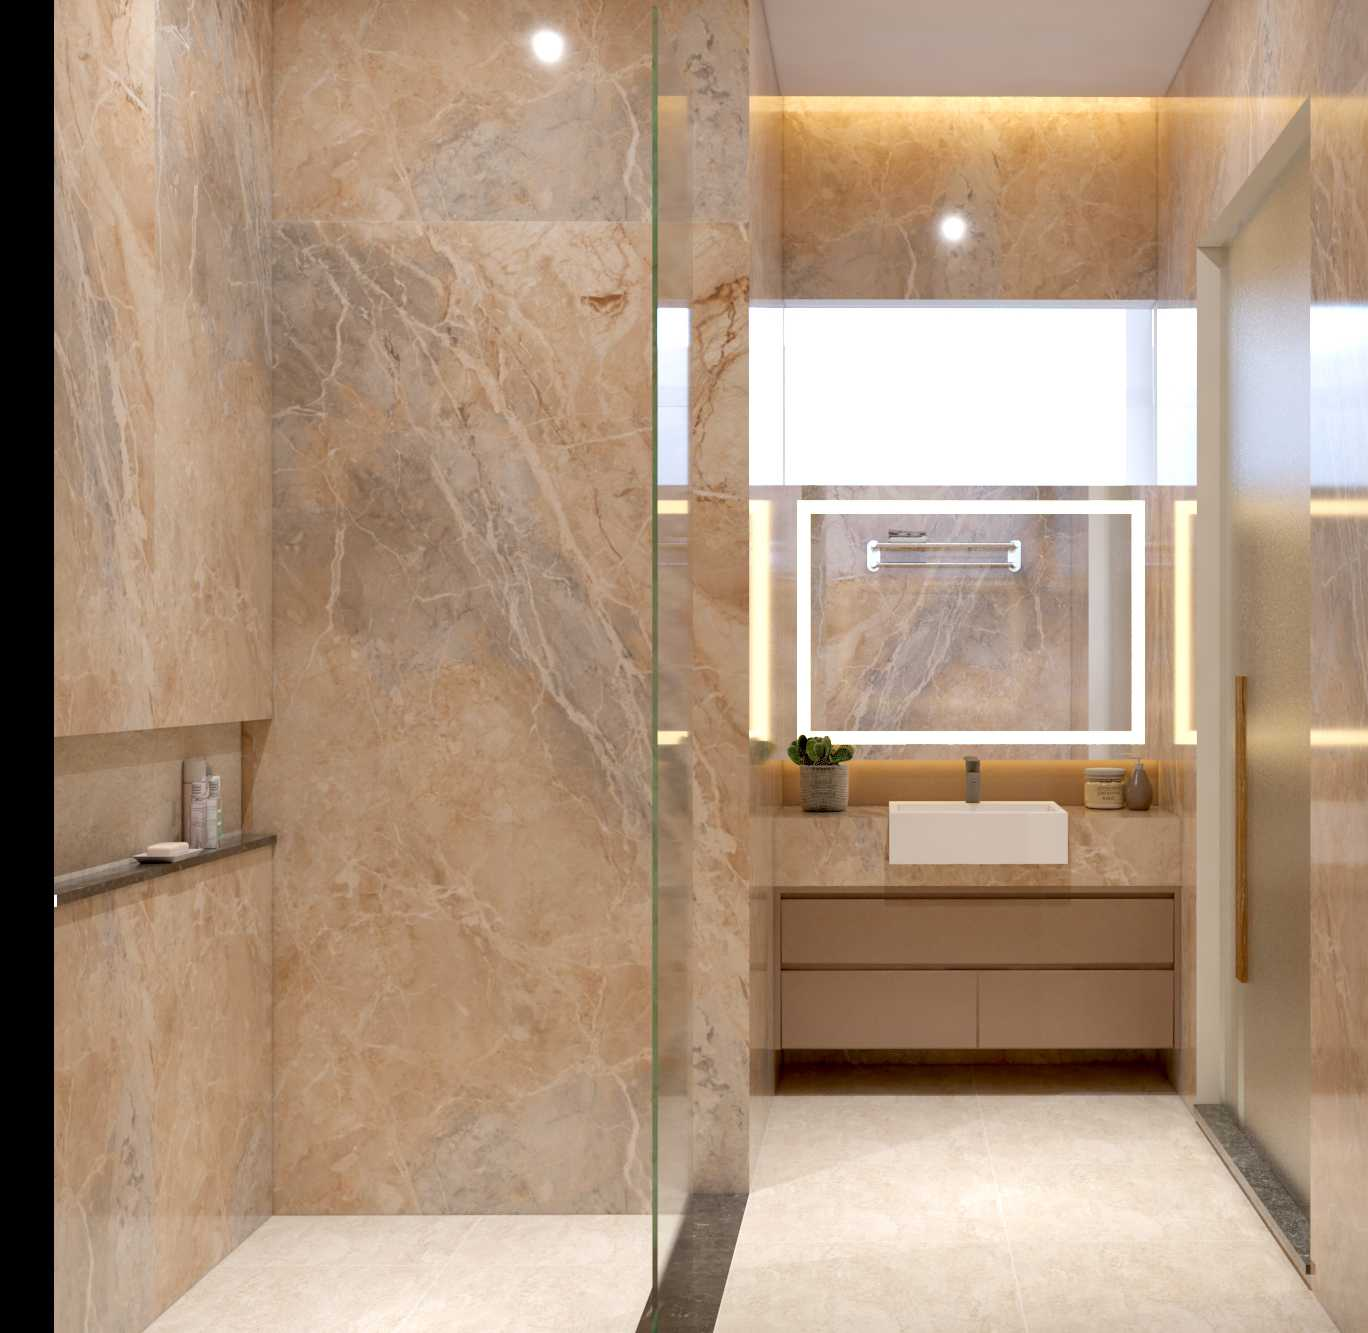 Conarch Studio Desain Minimalis Modern V House Surabaya, Kota Sby, Jawa Timur, Indonesia Surabaya, Kota Sby, Jawa Timur, Indonesia Conarch-Studio-Desain-Minimalis-Modern-V-House   134775